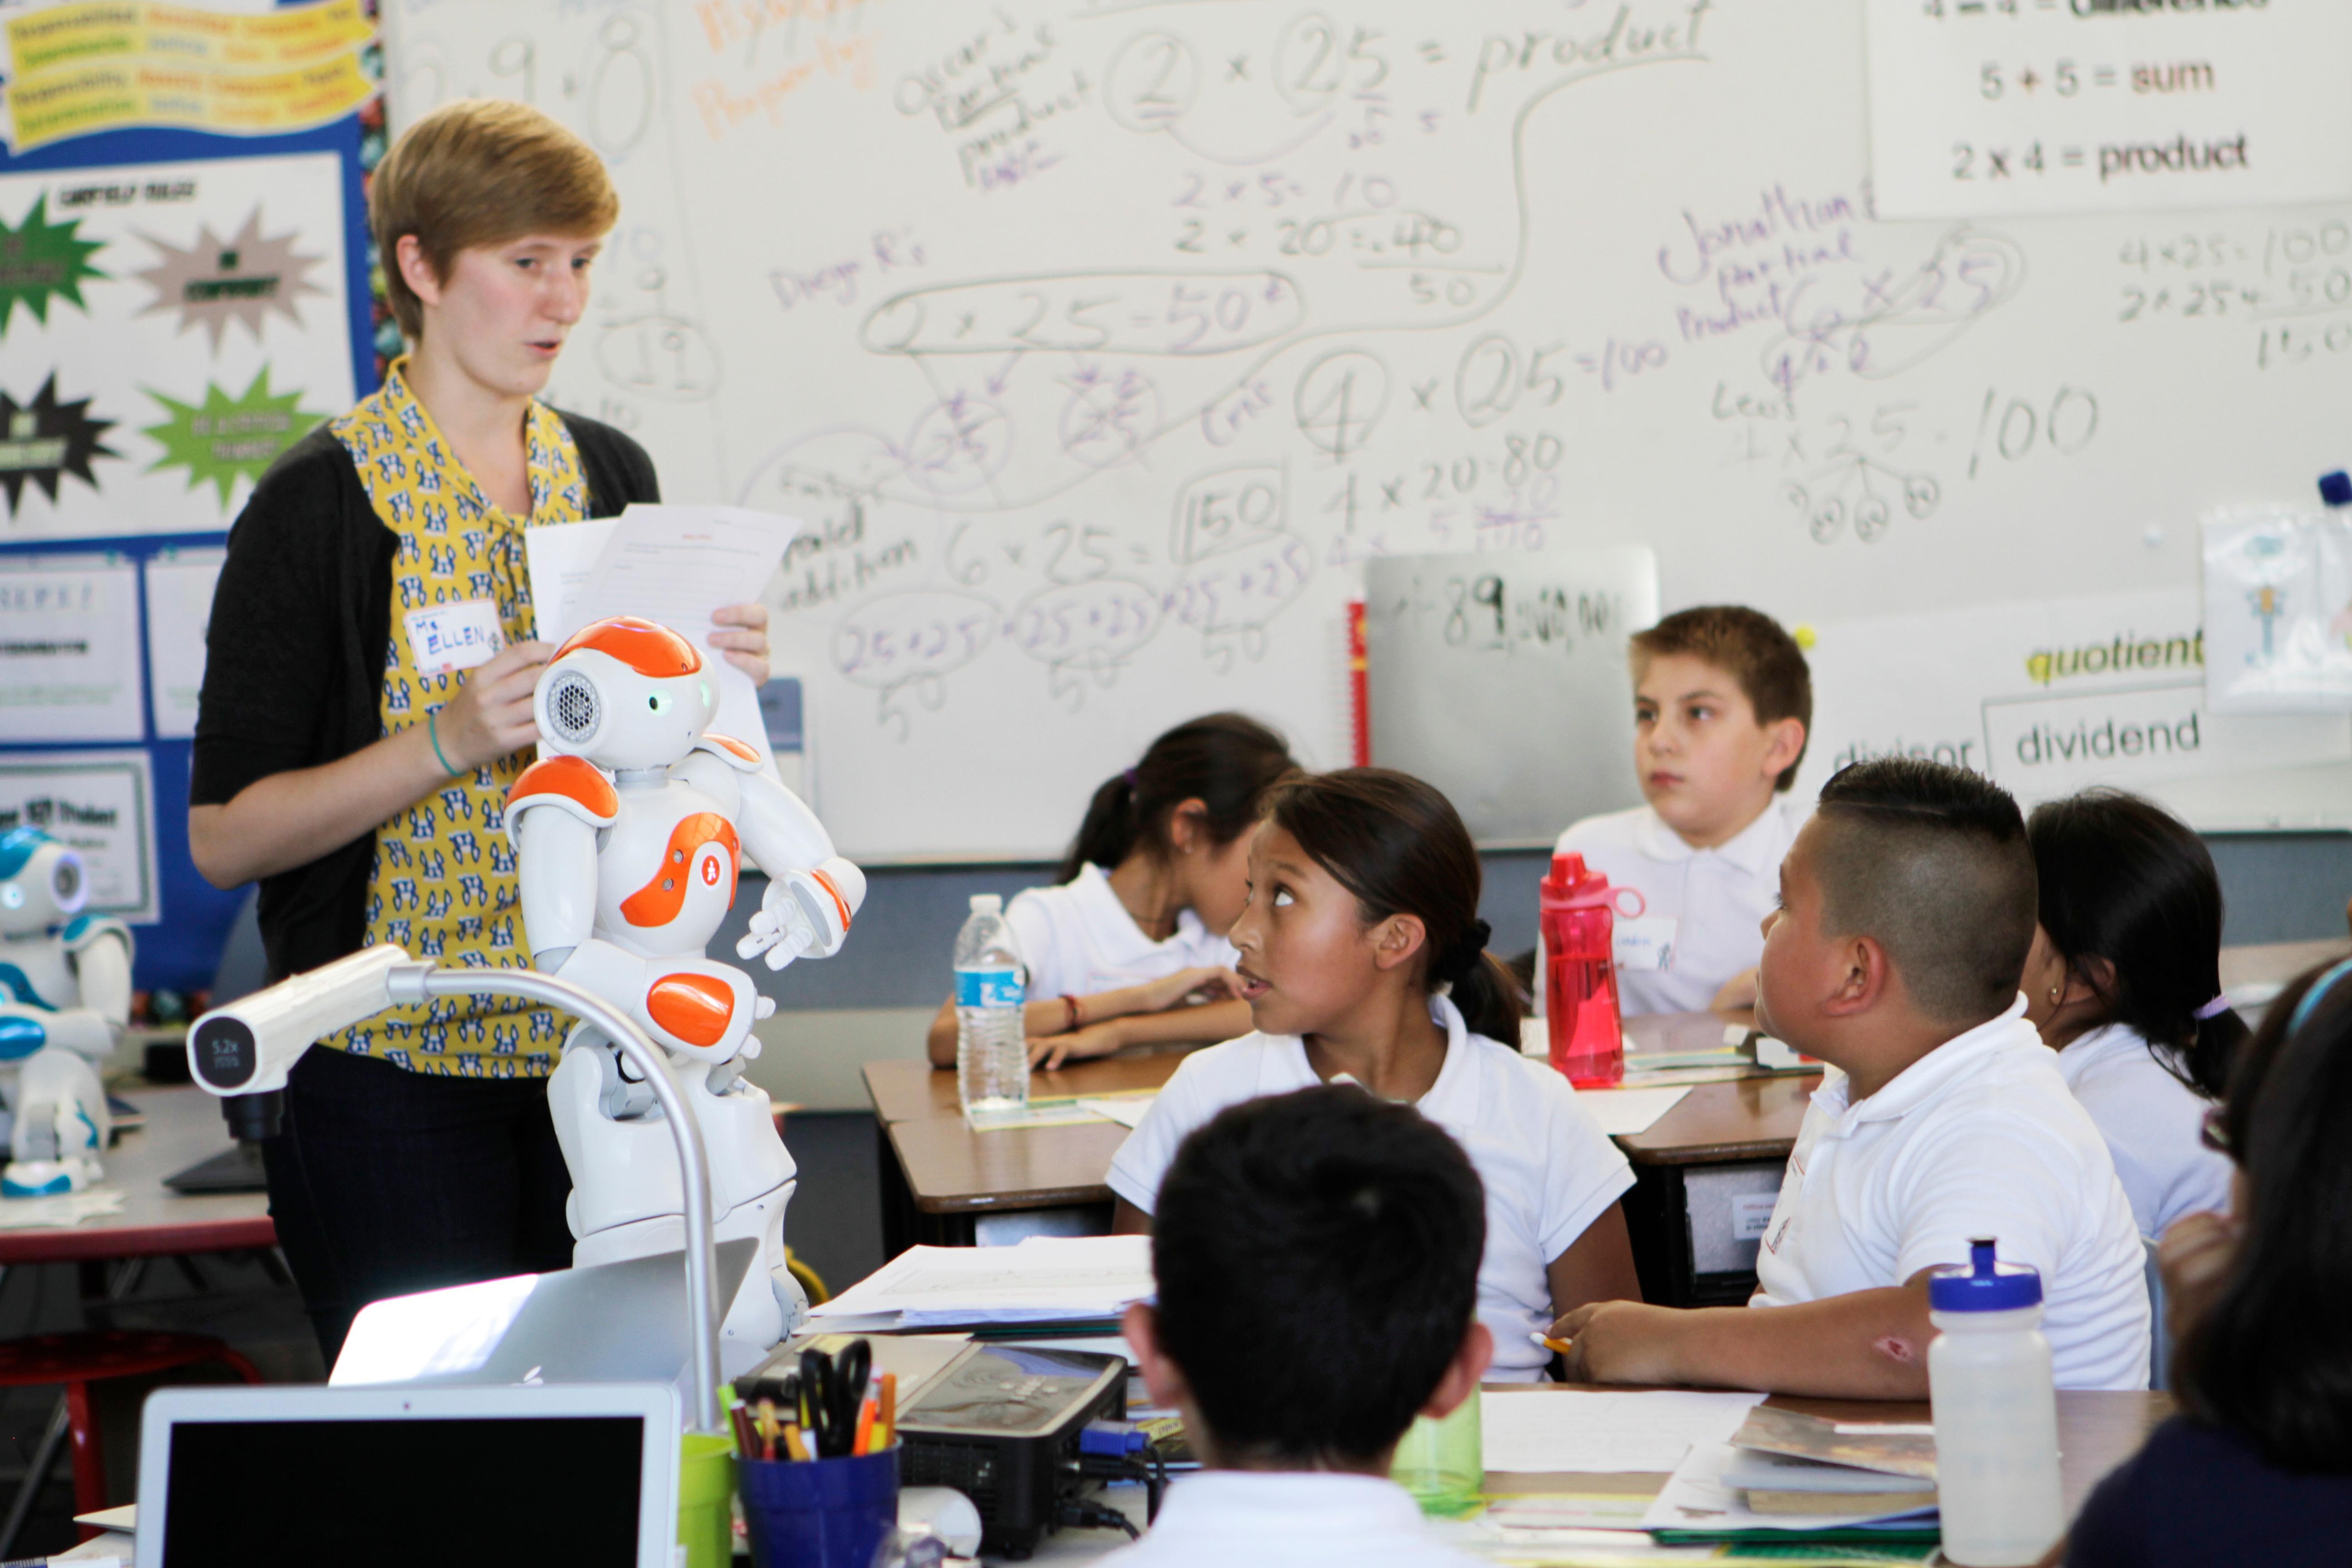 Teacher with NAO robot